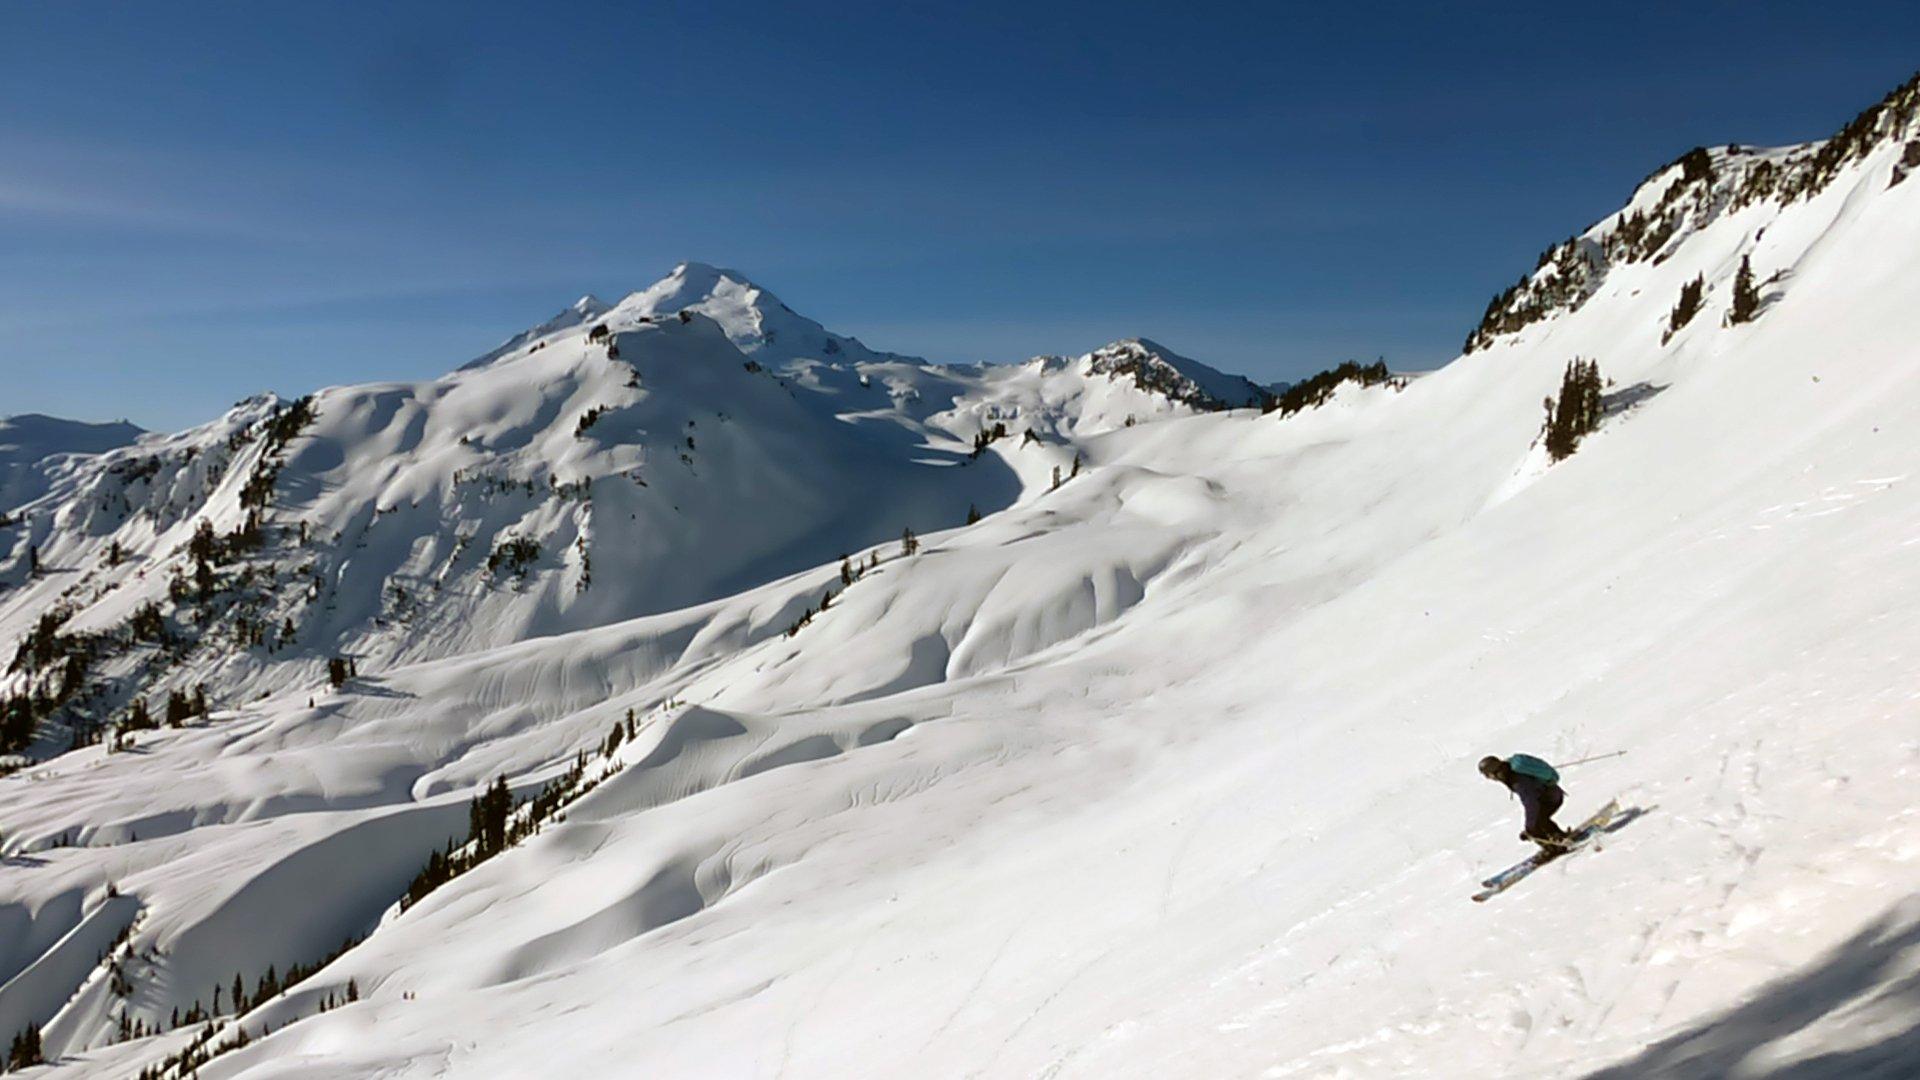 Ski Mountain Wallpaper Wallpapersafari